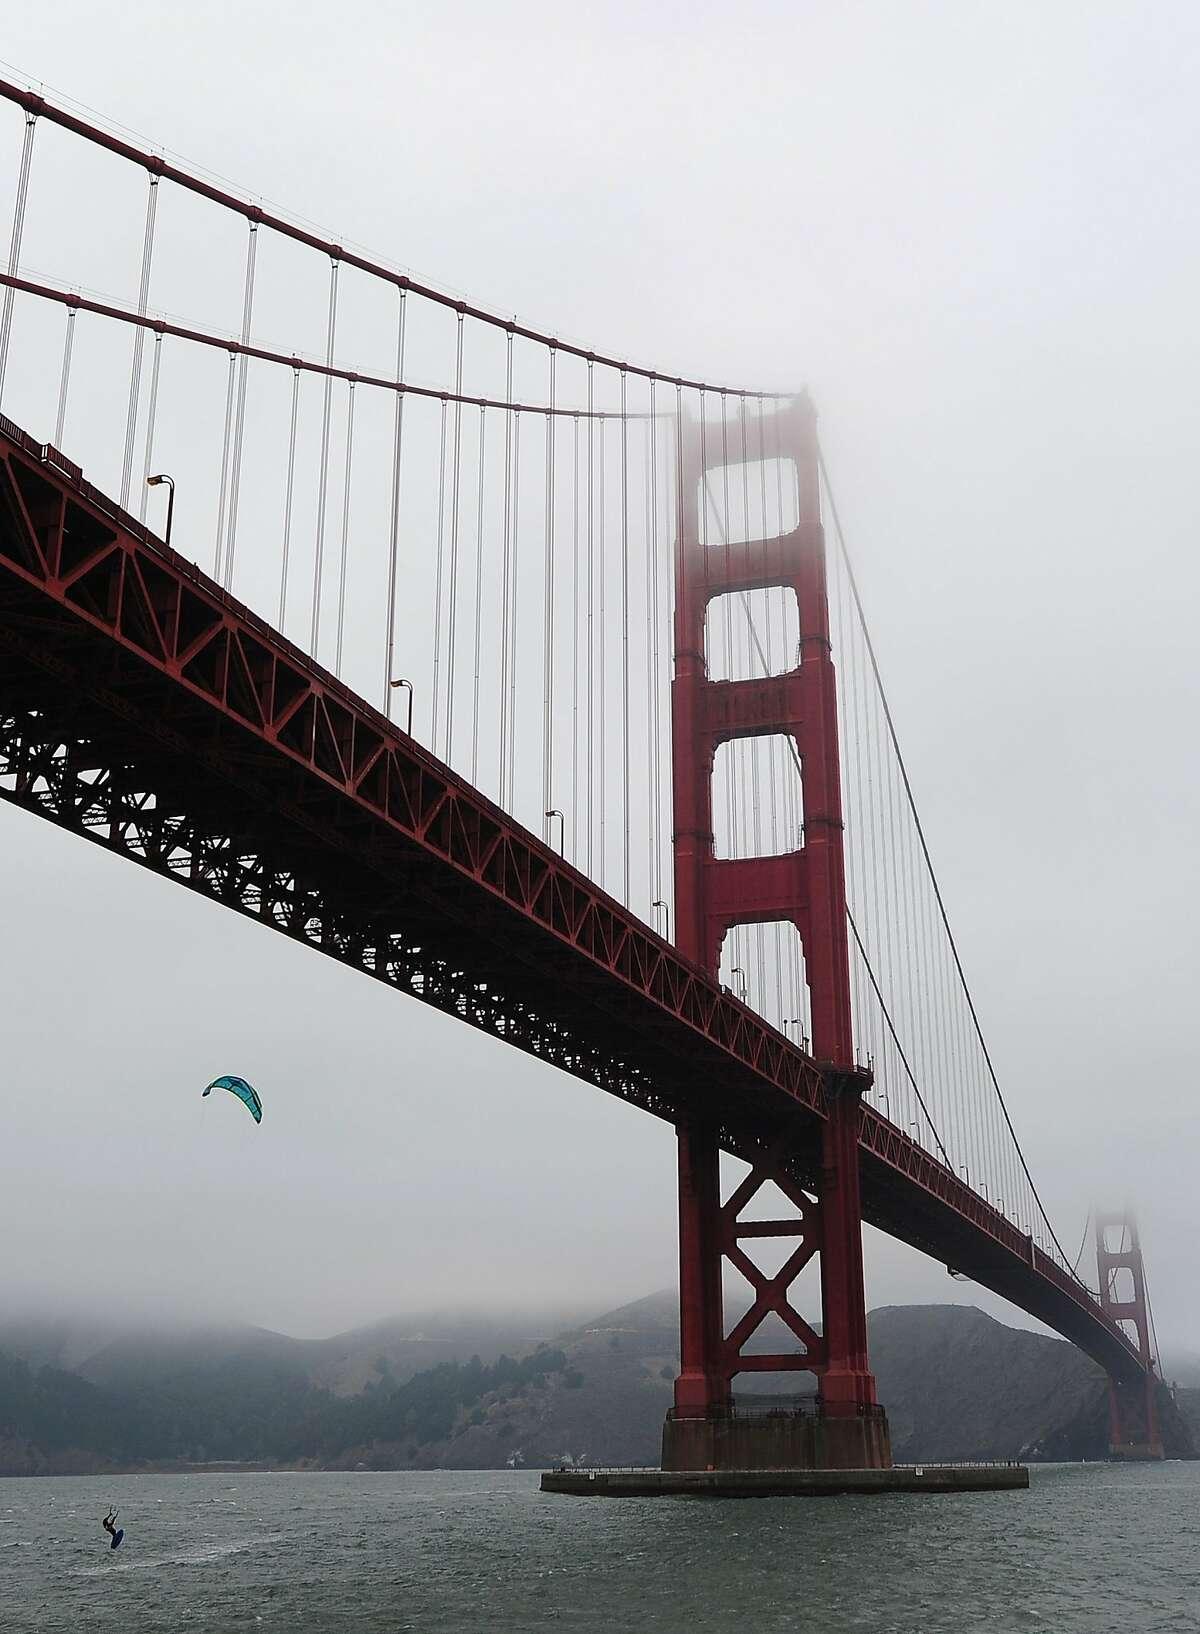 The Golden Gate Bridge, site of the stunt.